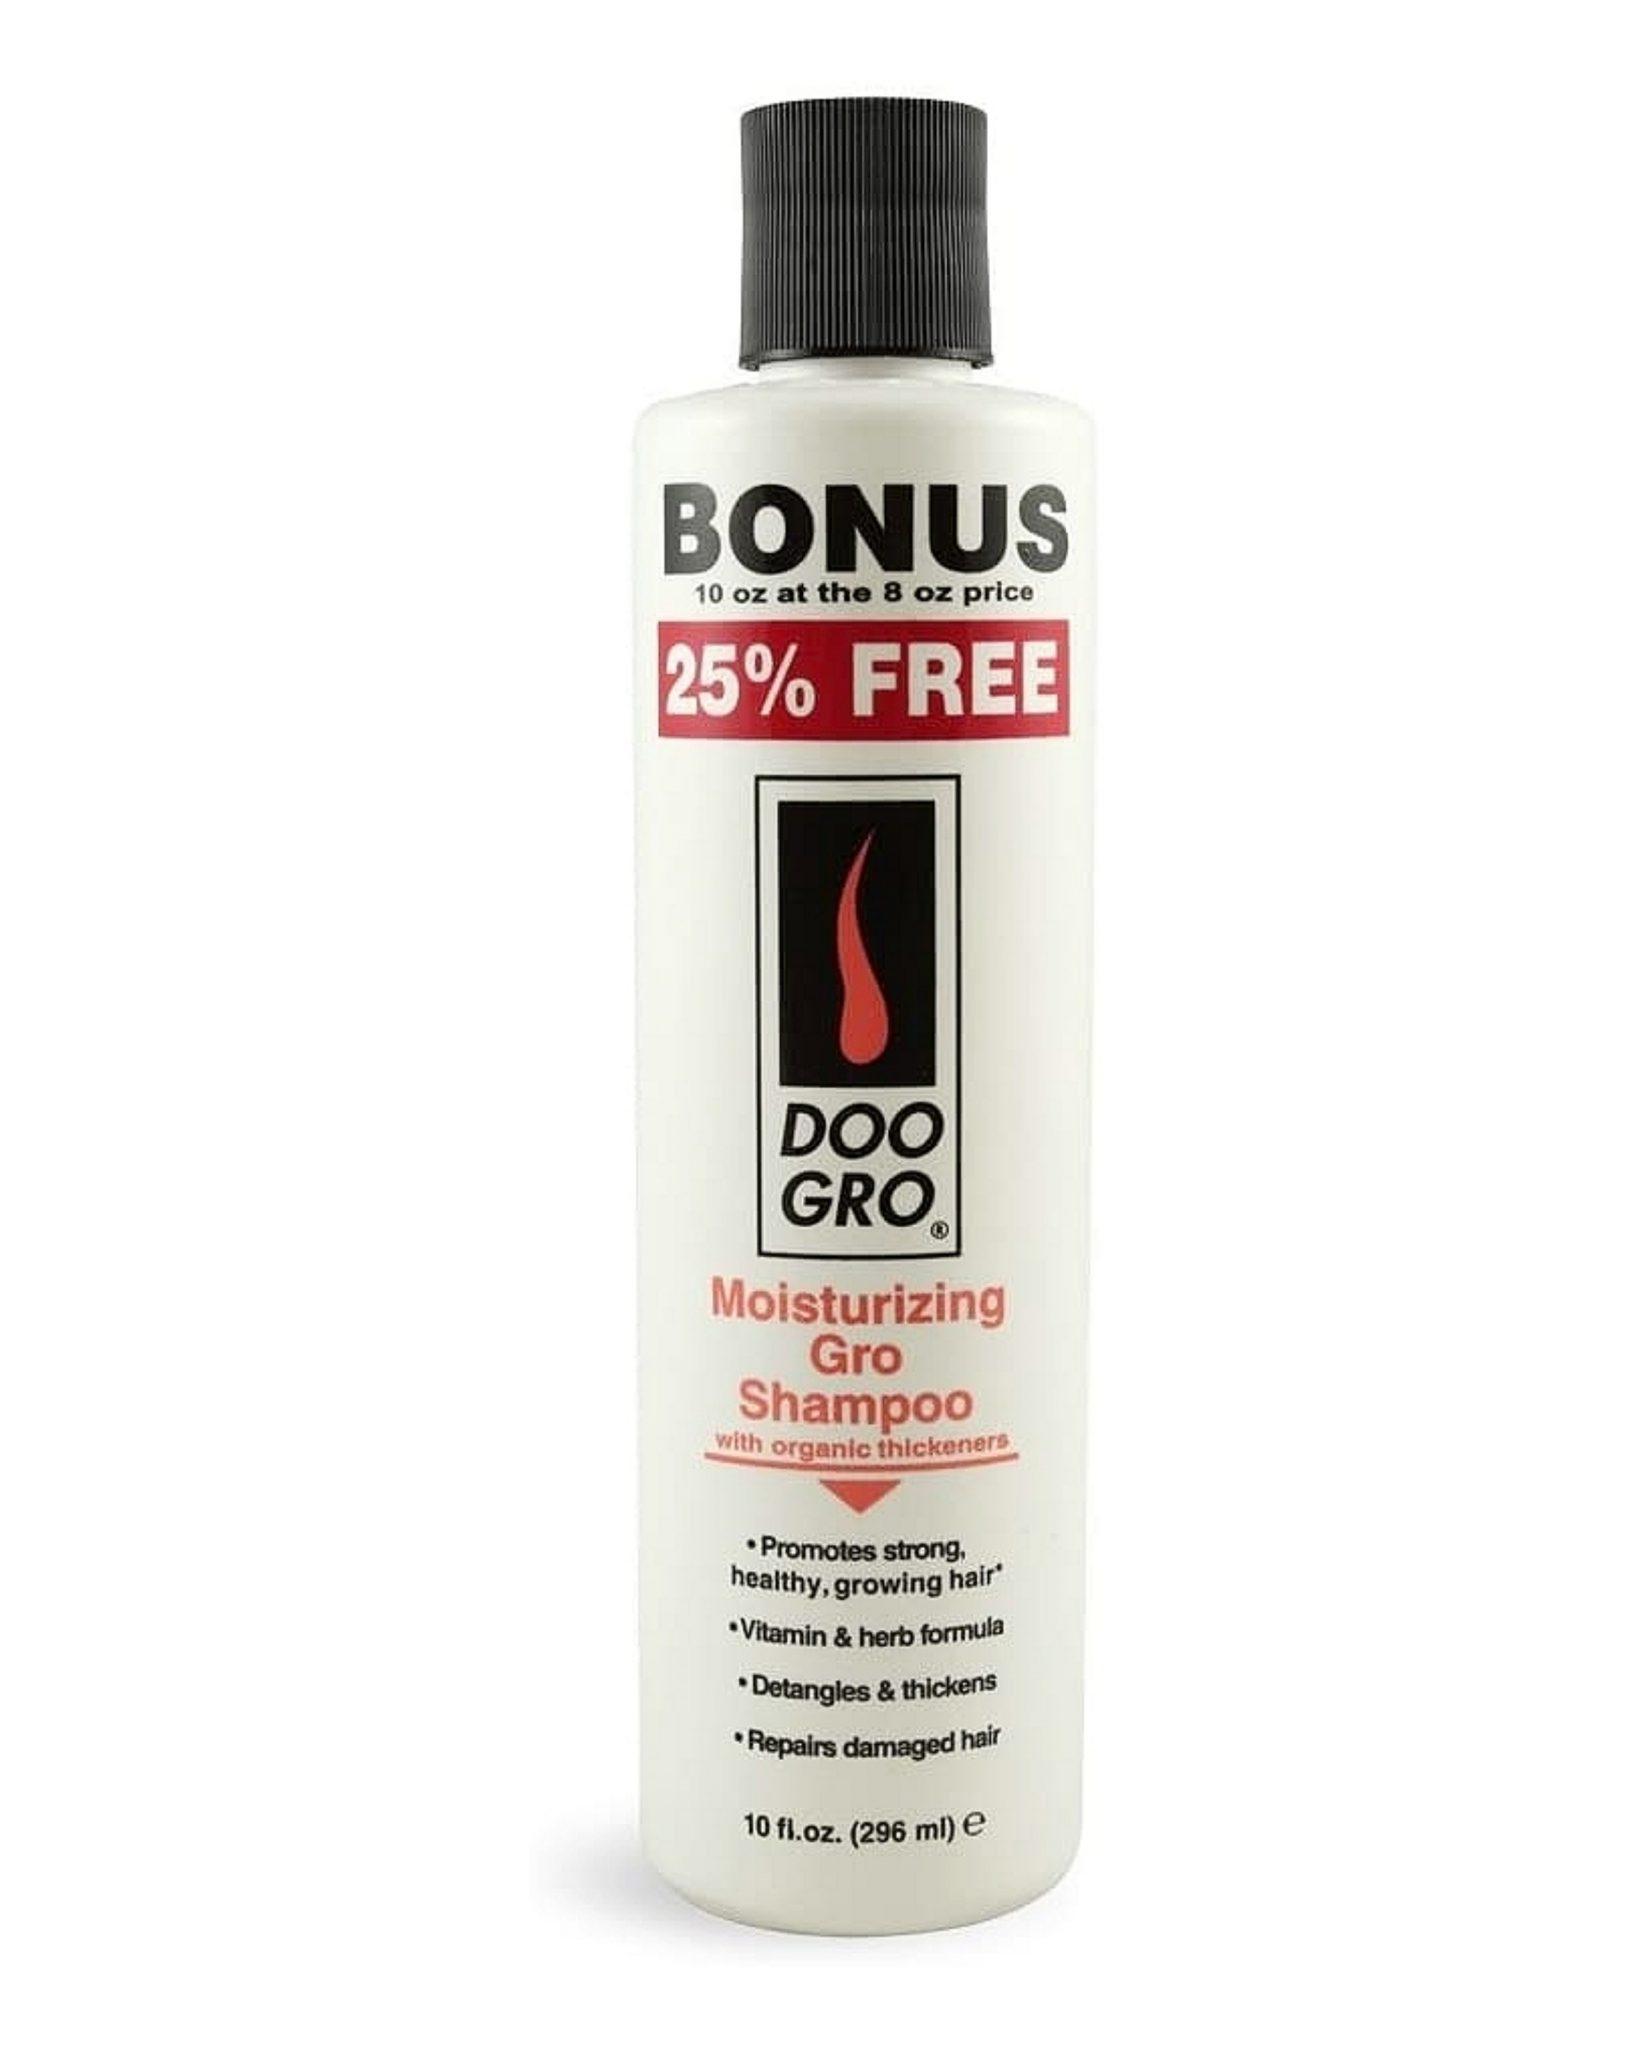 Doo Gro Moisturizing Gro Shampoo BONUS SIZE 10Oz